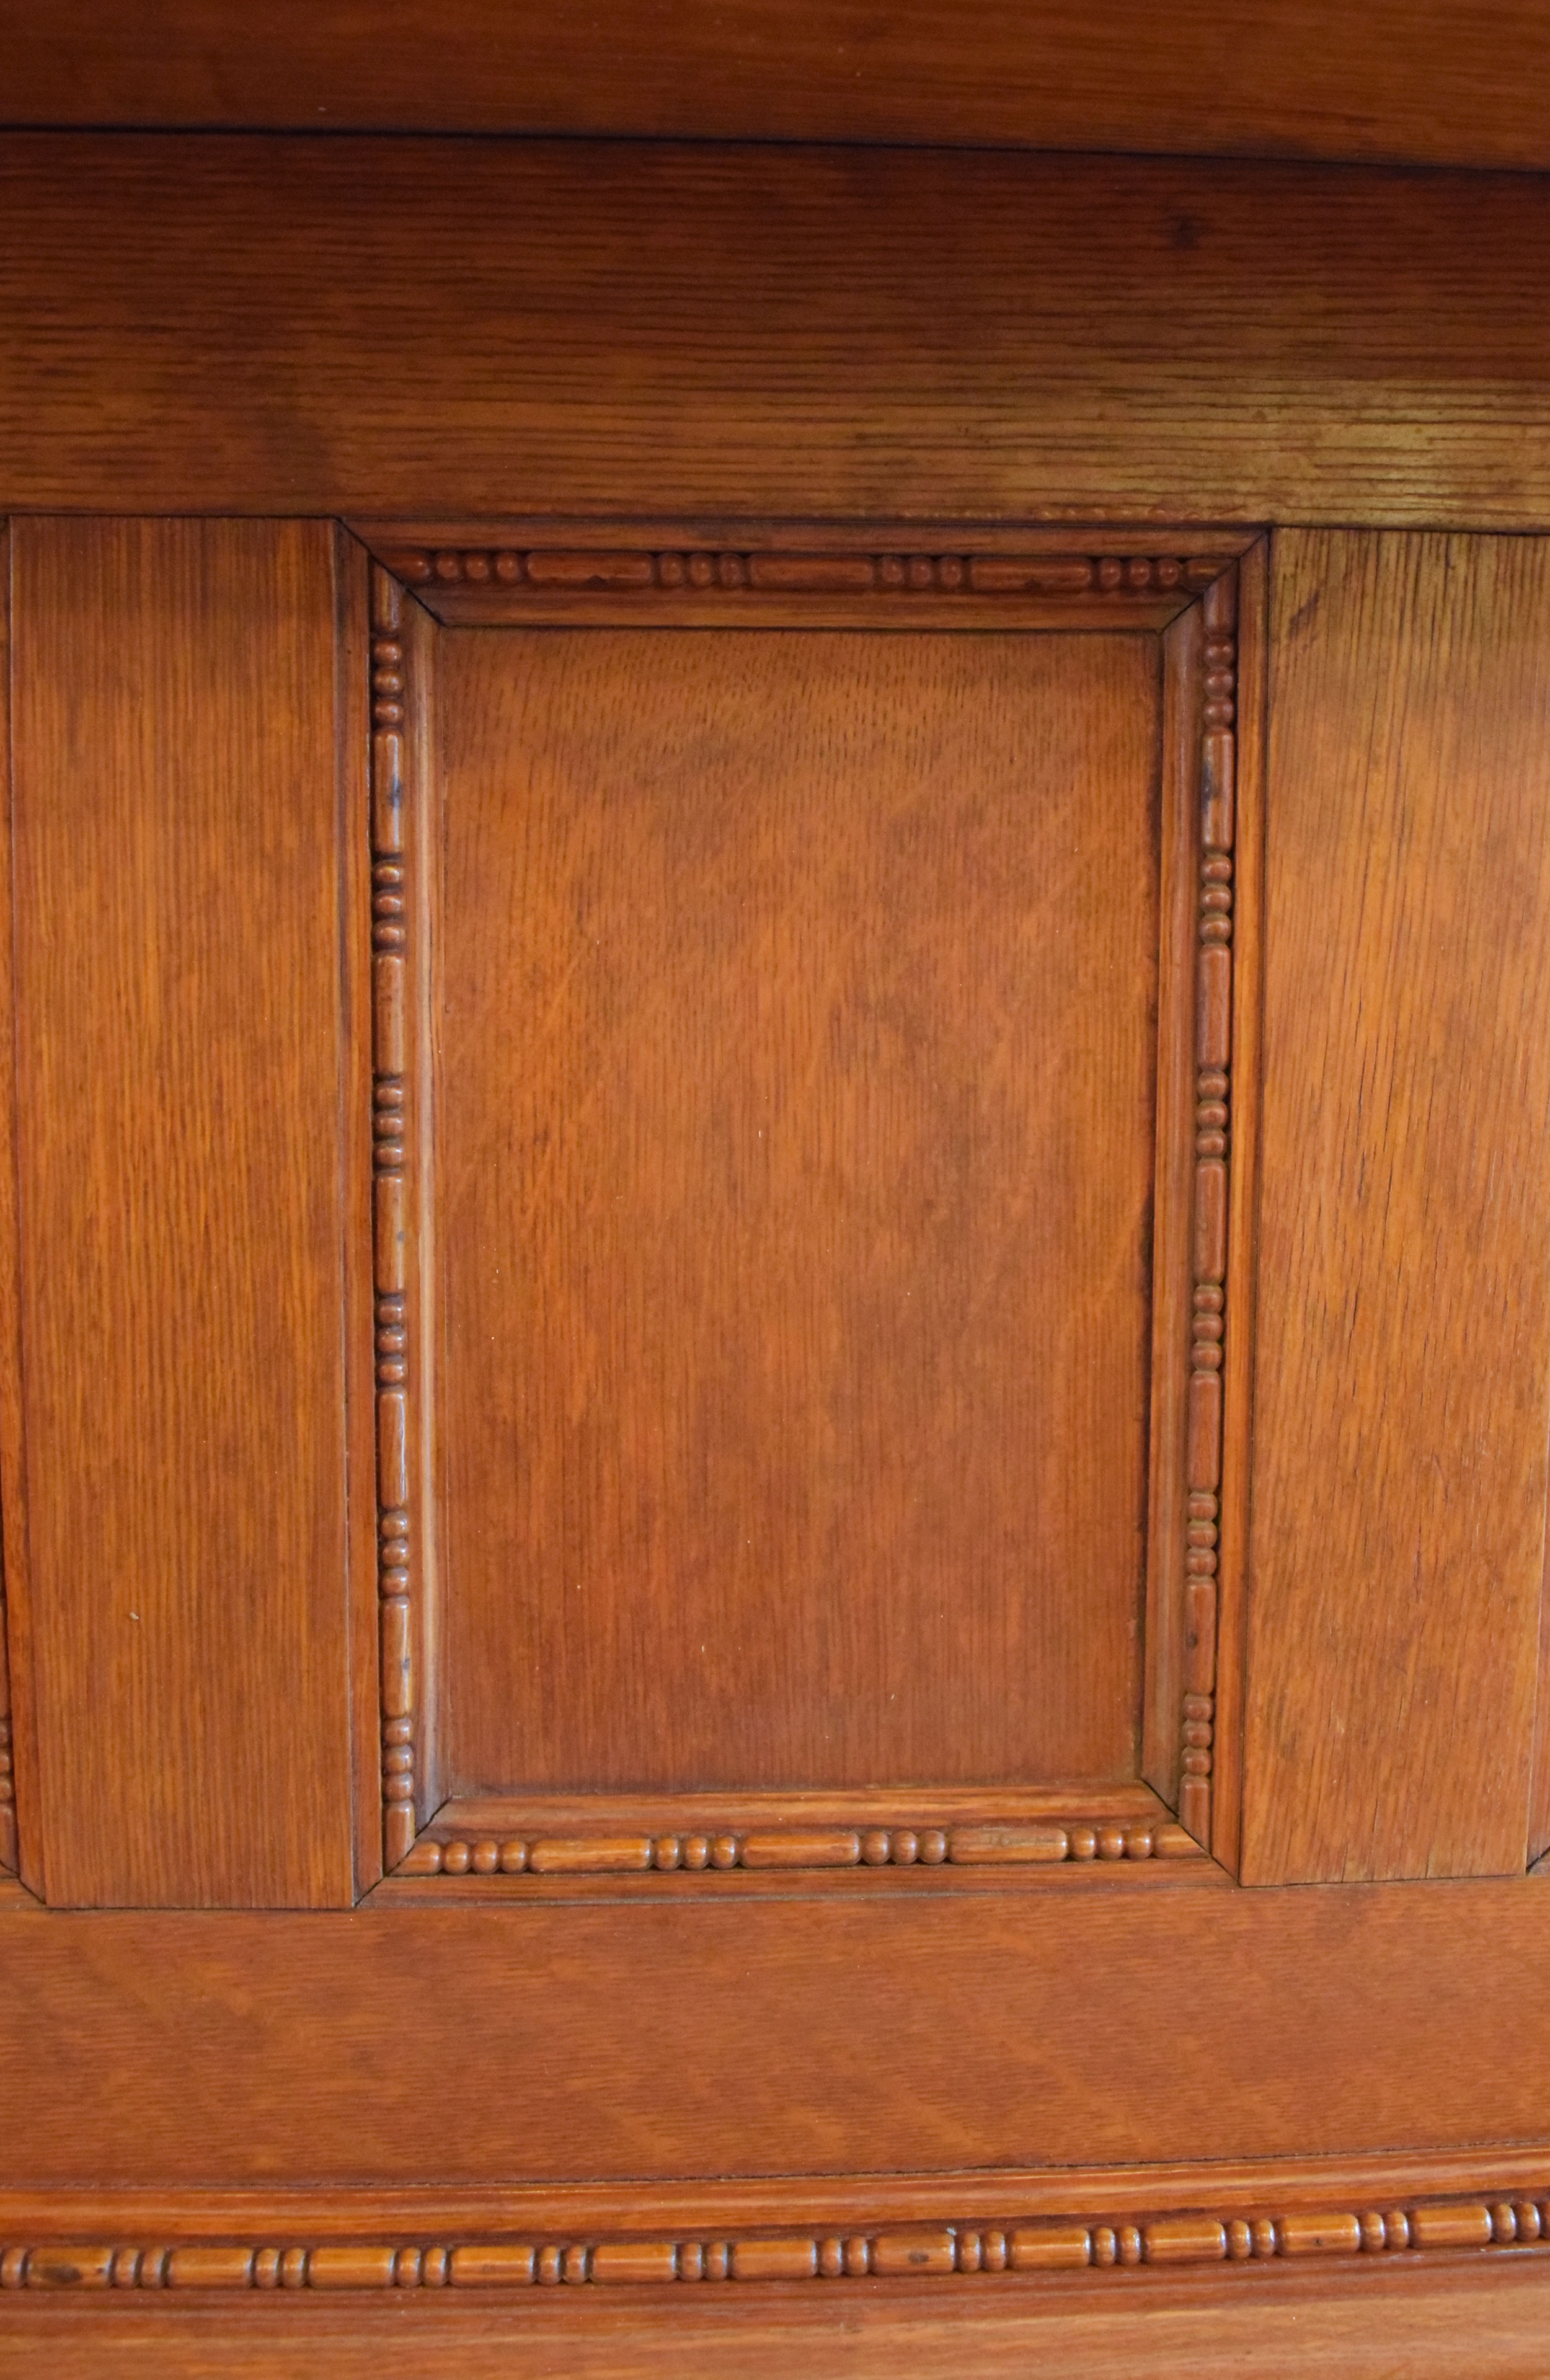 47048-quarter-sawn-oak-header-detail-1.jpg